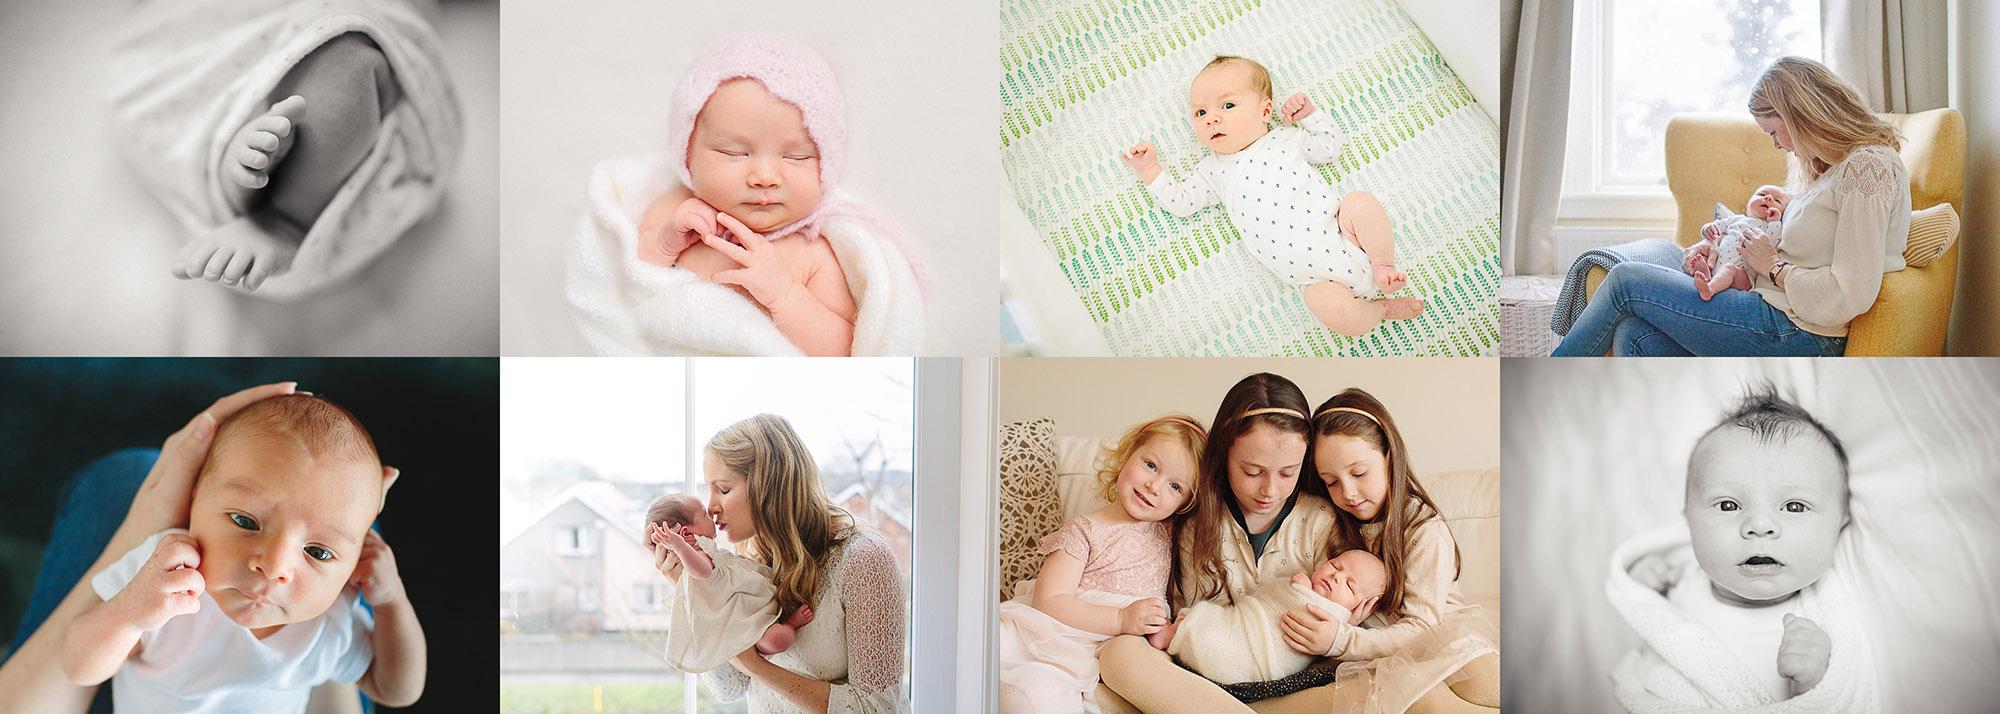 newborn phtography dublin